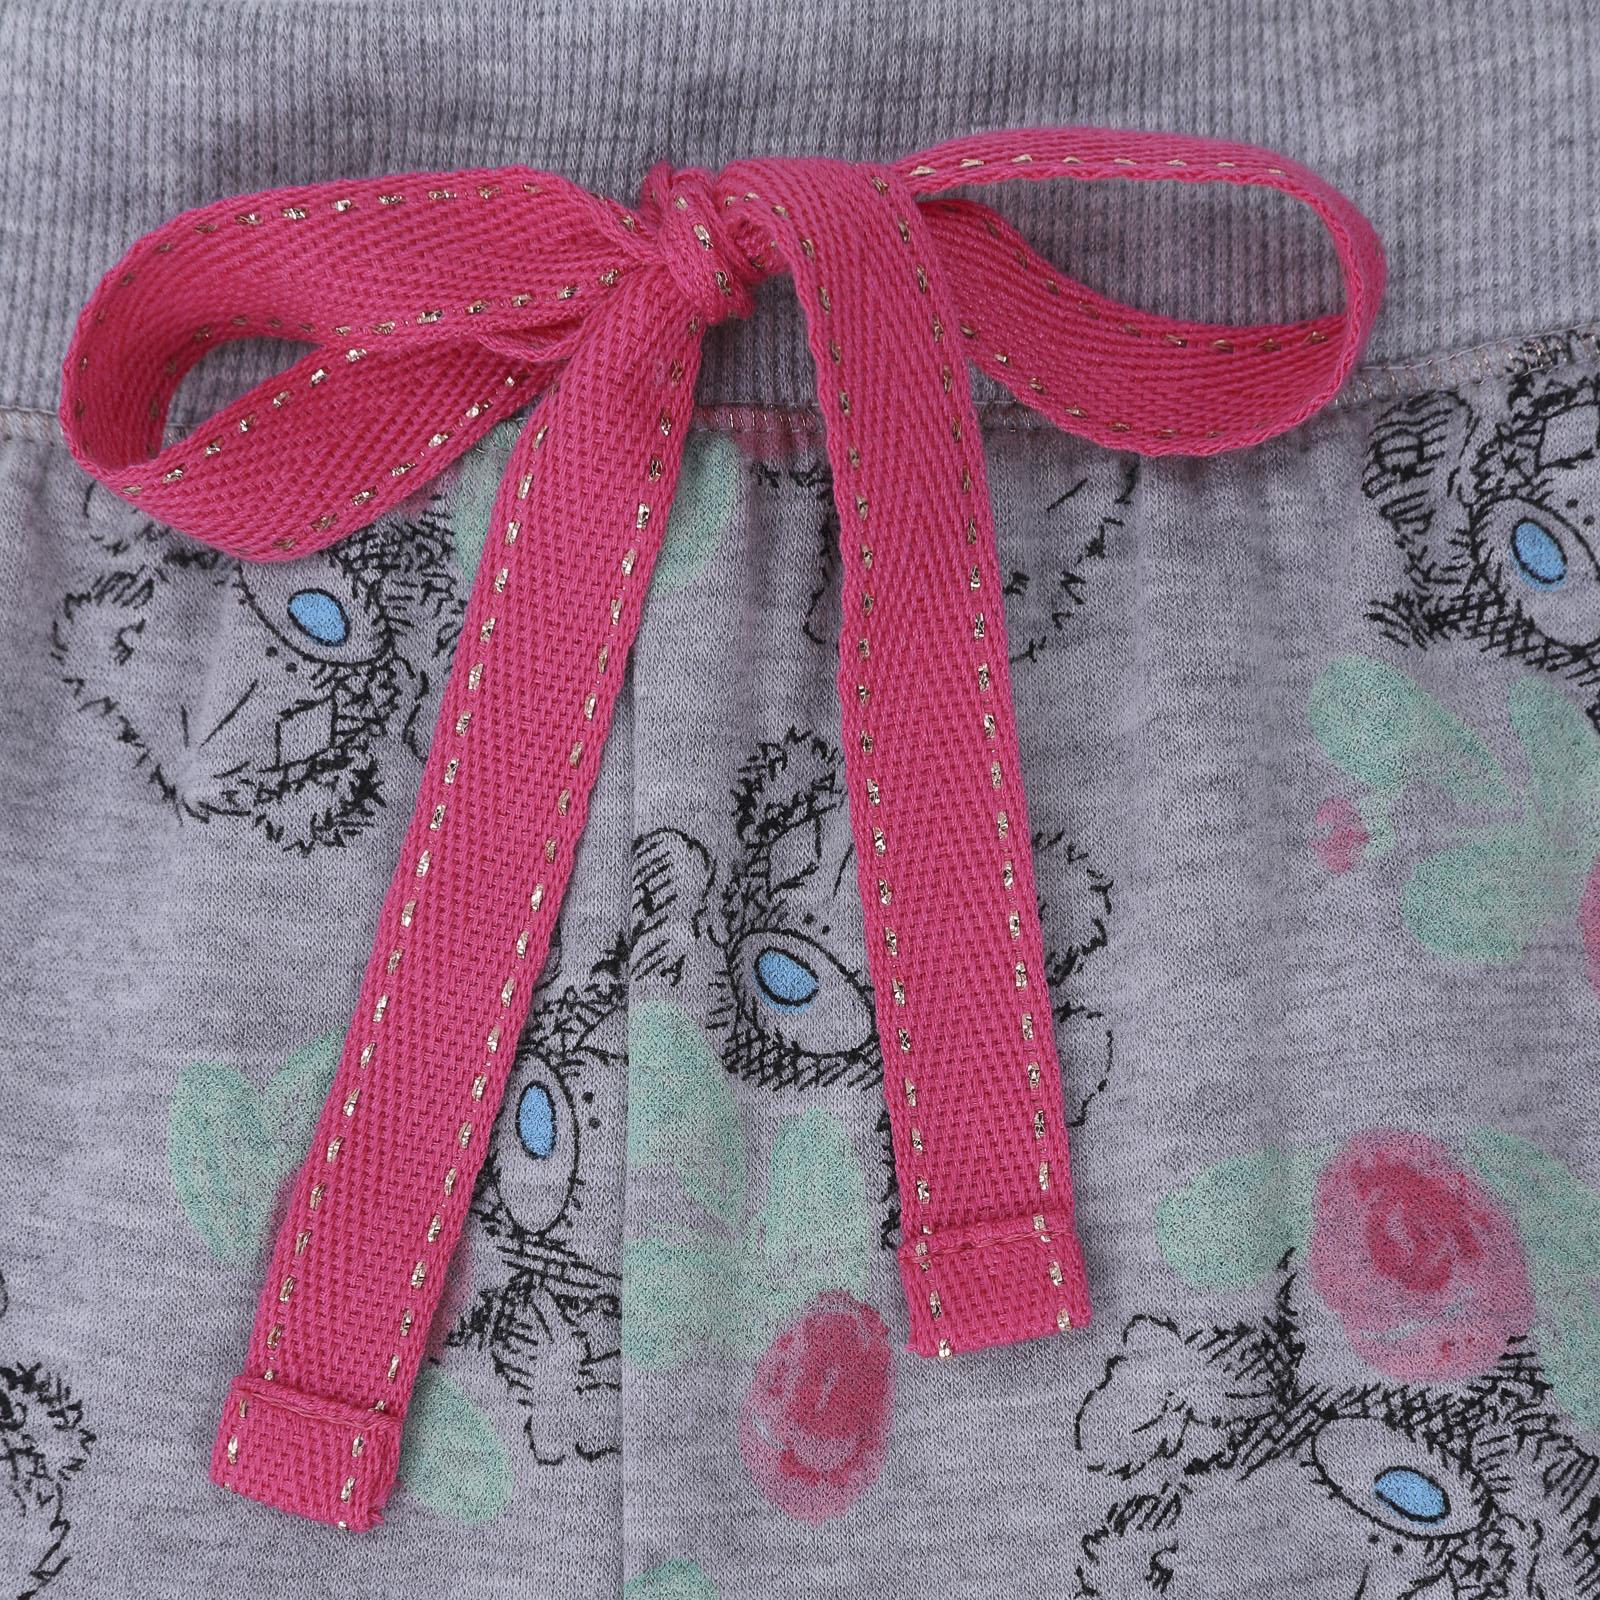 Me To You Tatty Teddy Official Gift Ladies Loungewear Nightwear Pyjamas